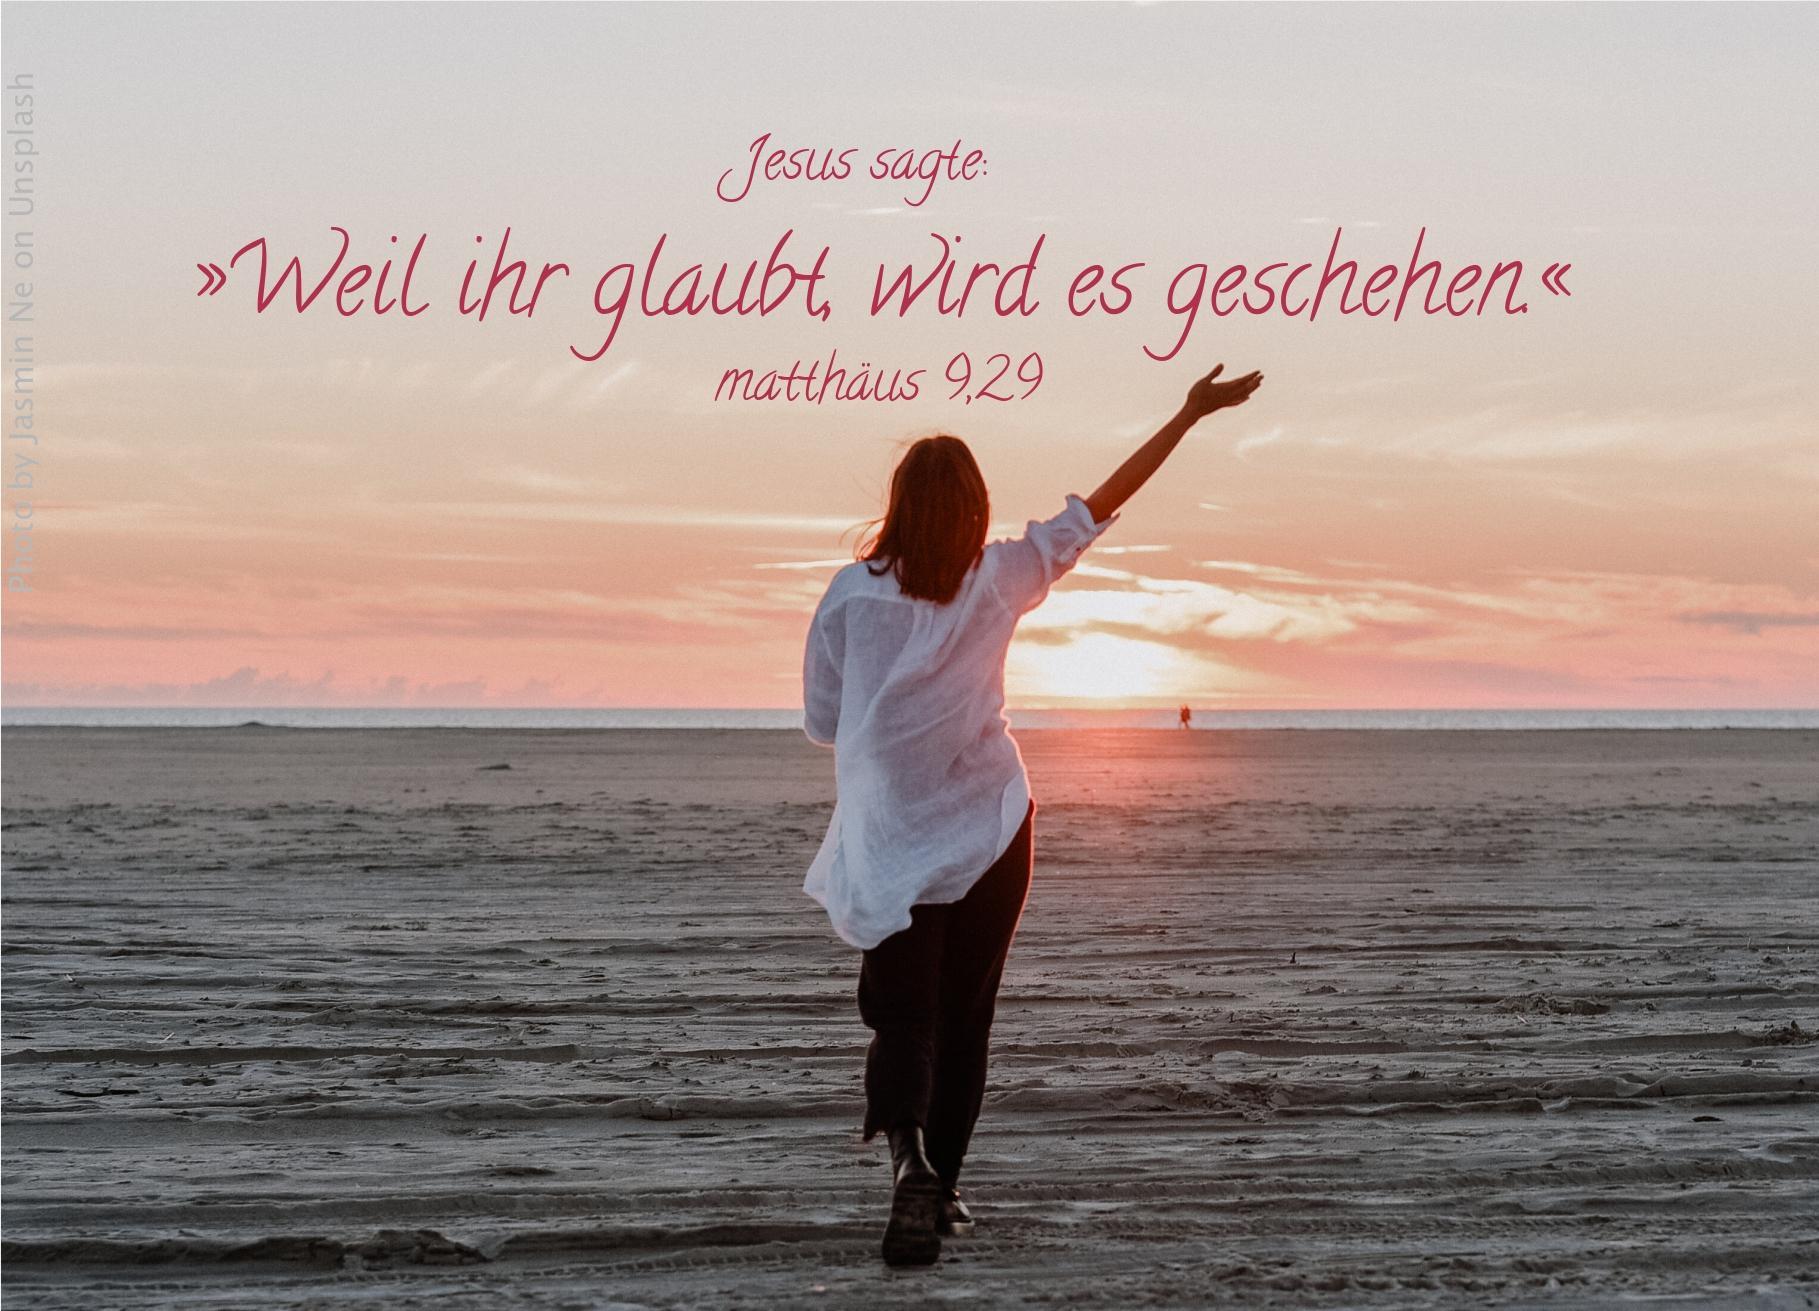 "alt=""frau_am_meer_mit_erhobenem_arm_erwartet_bibelhoerbuch_jesus_heilt_durch_glauben"""